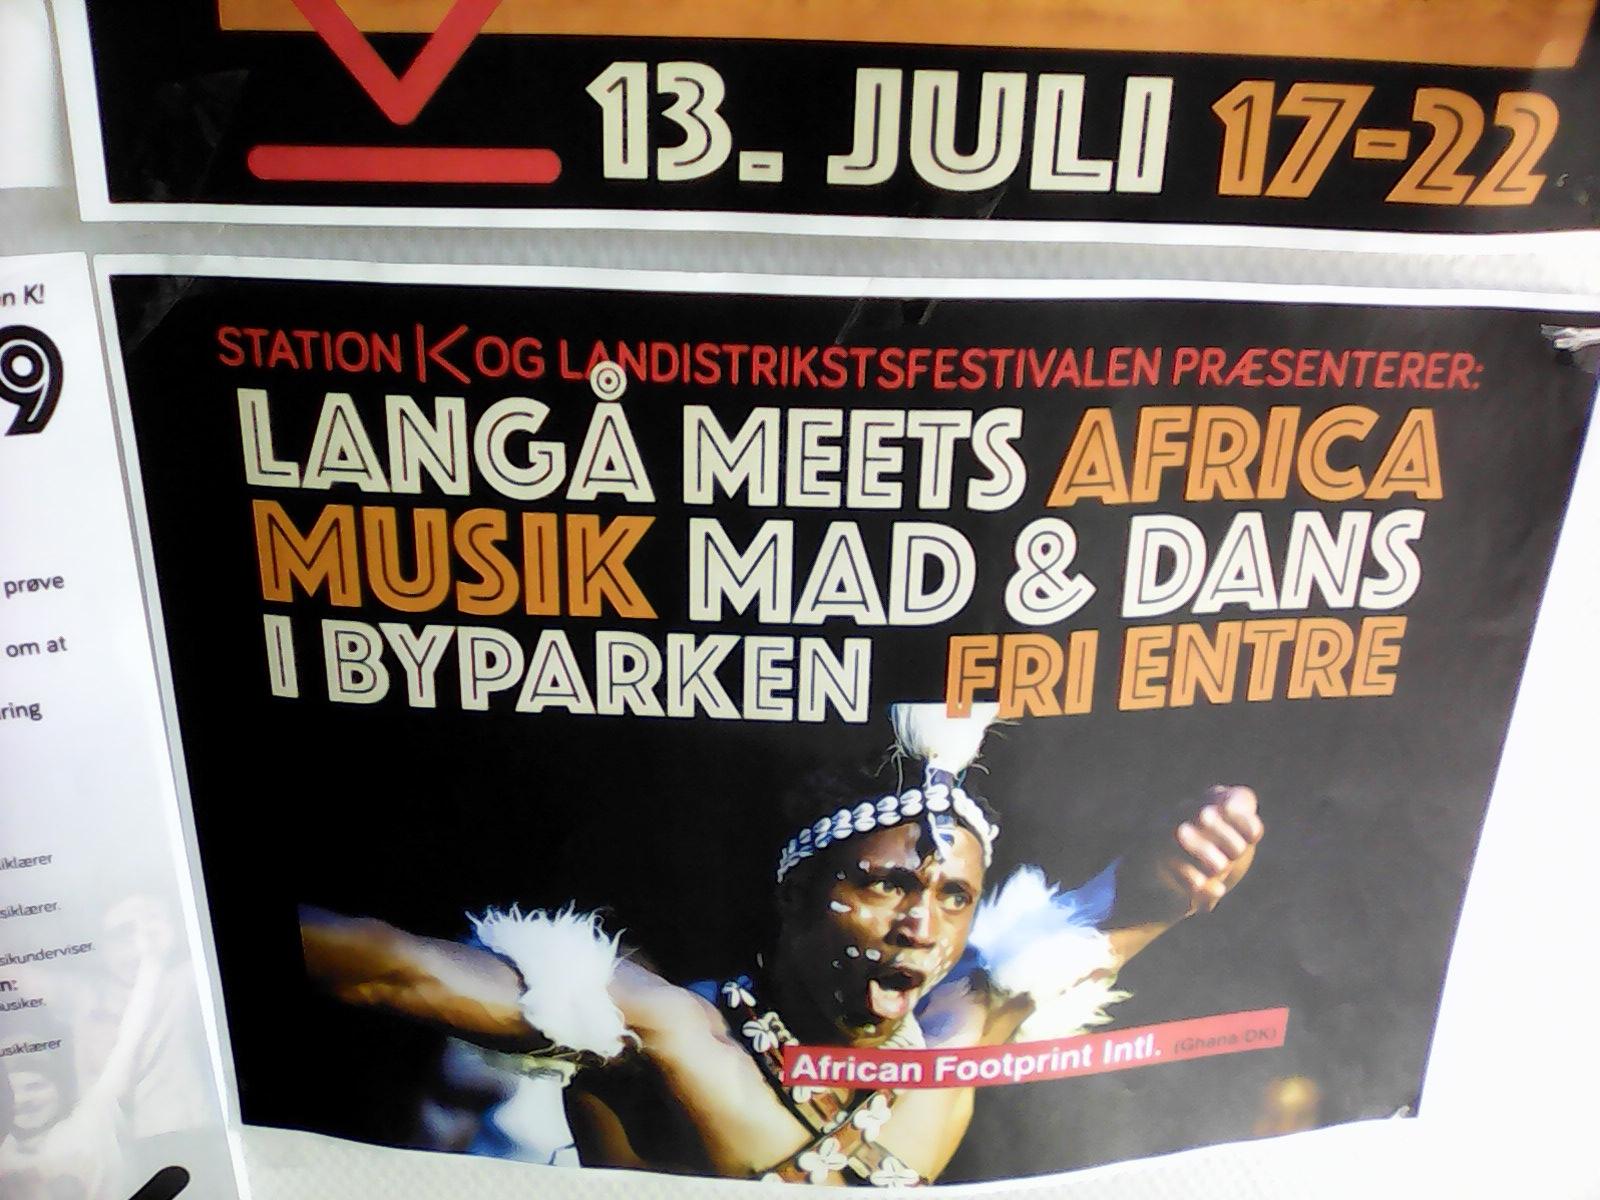 Koncert Langå meets Africa